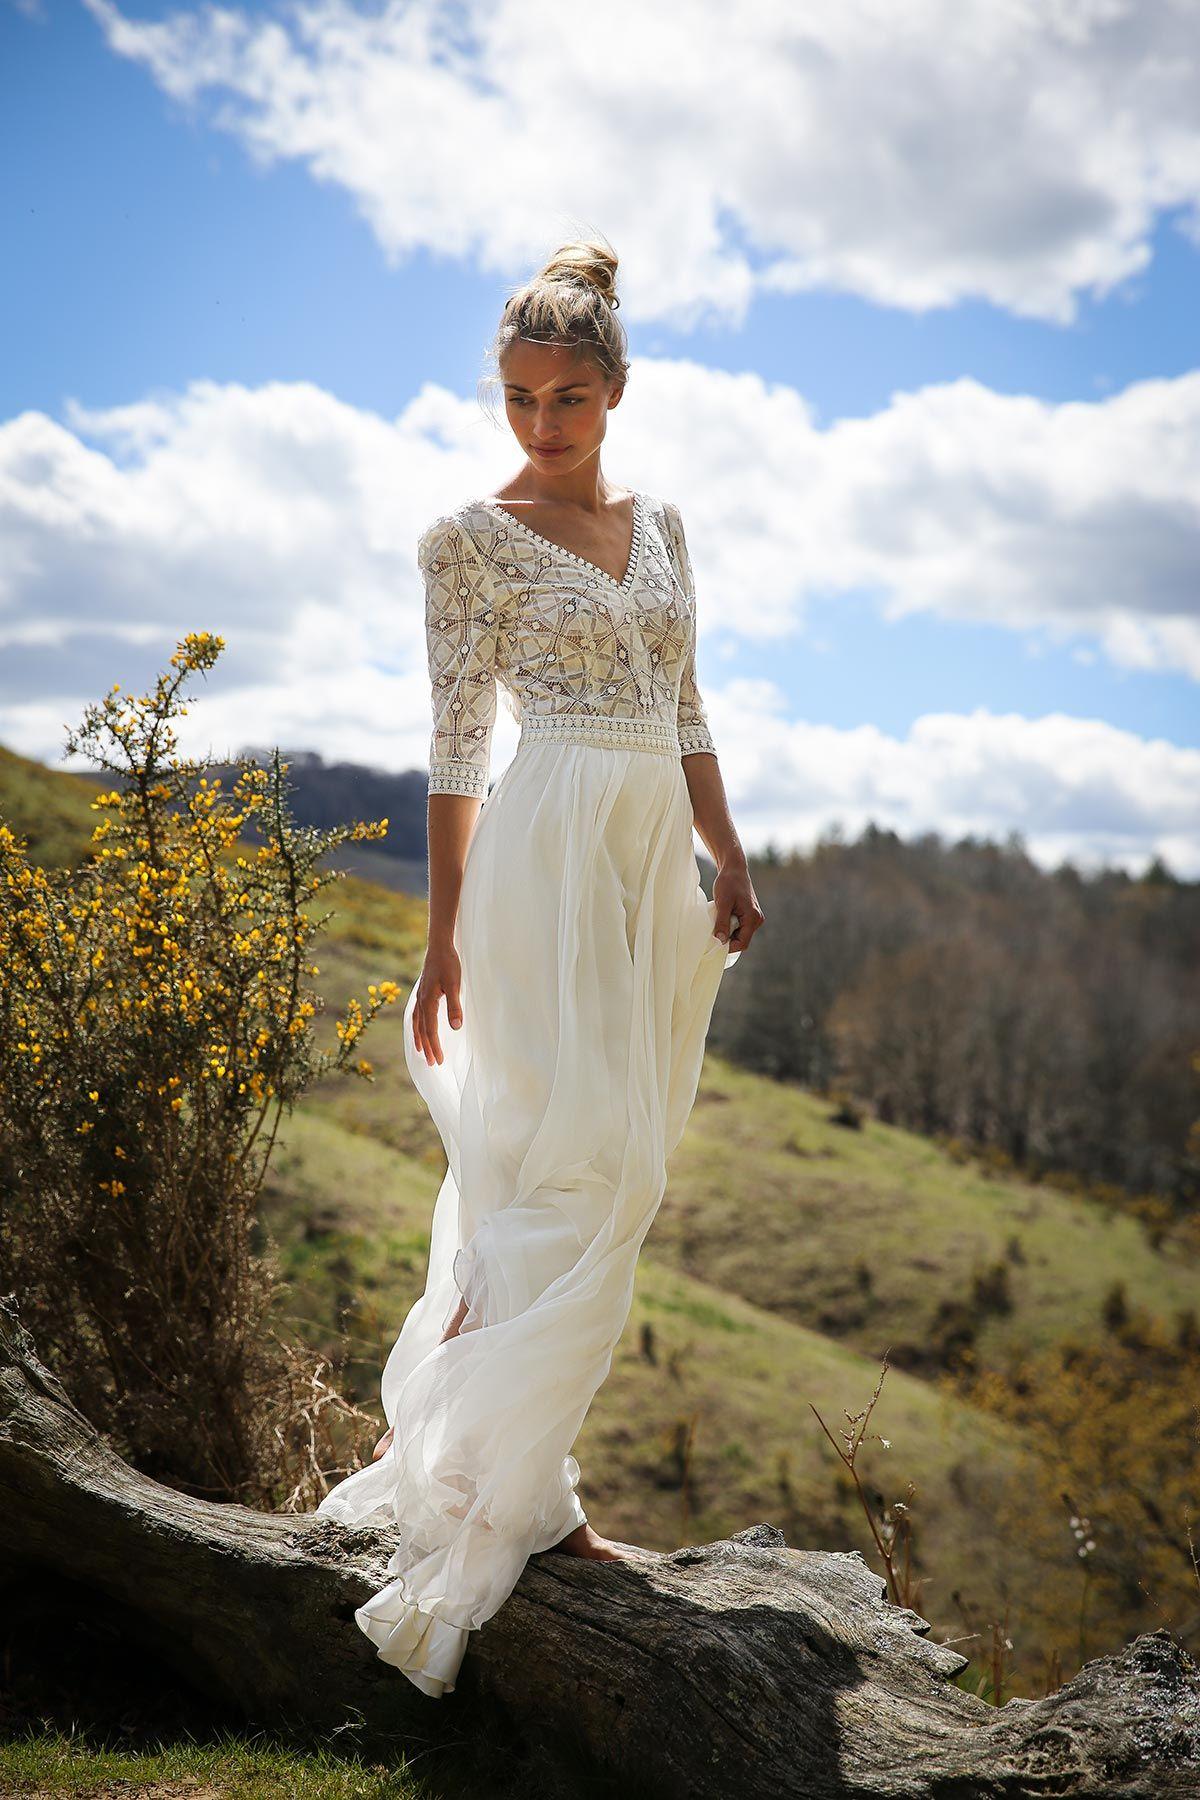 Creatrice robe mariee boheme